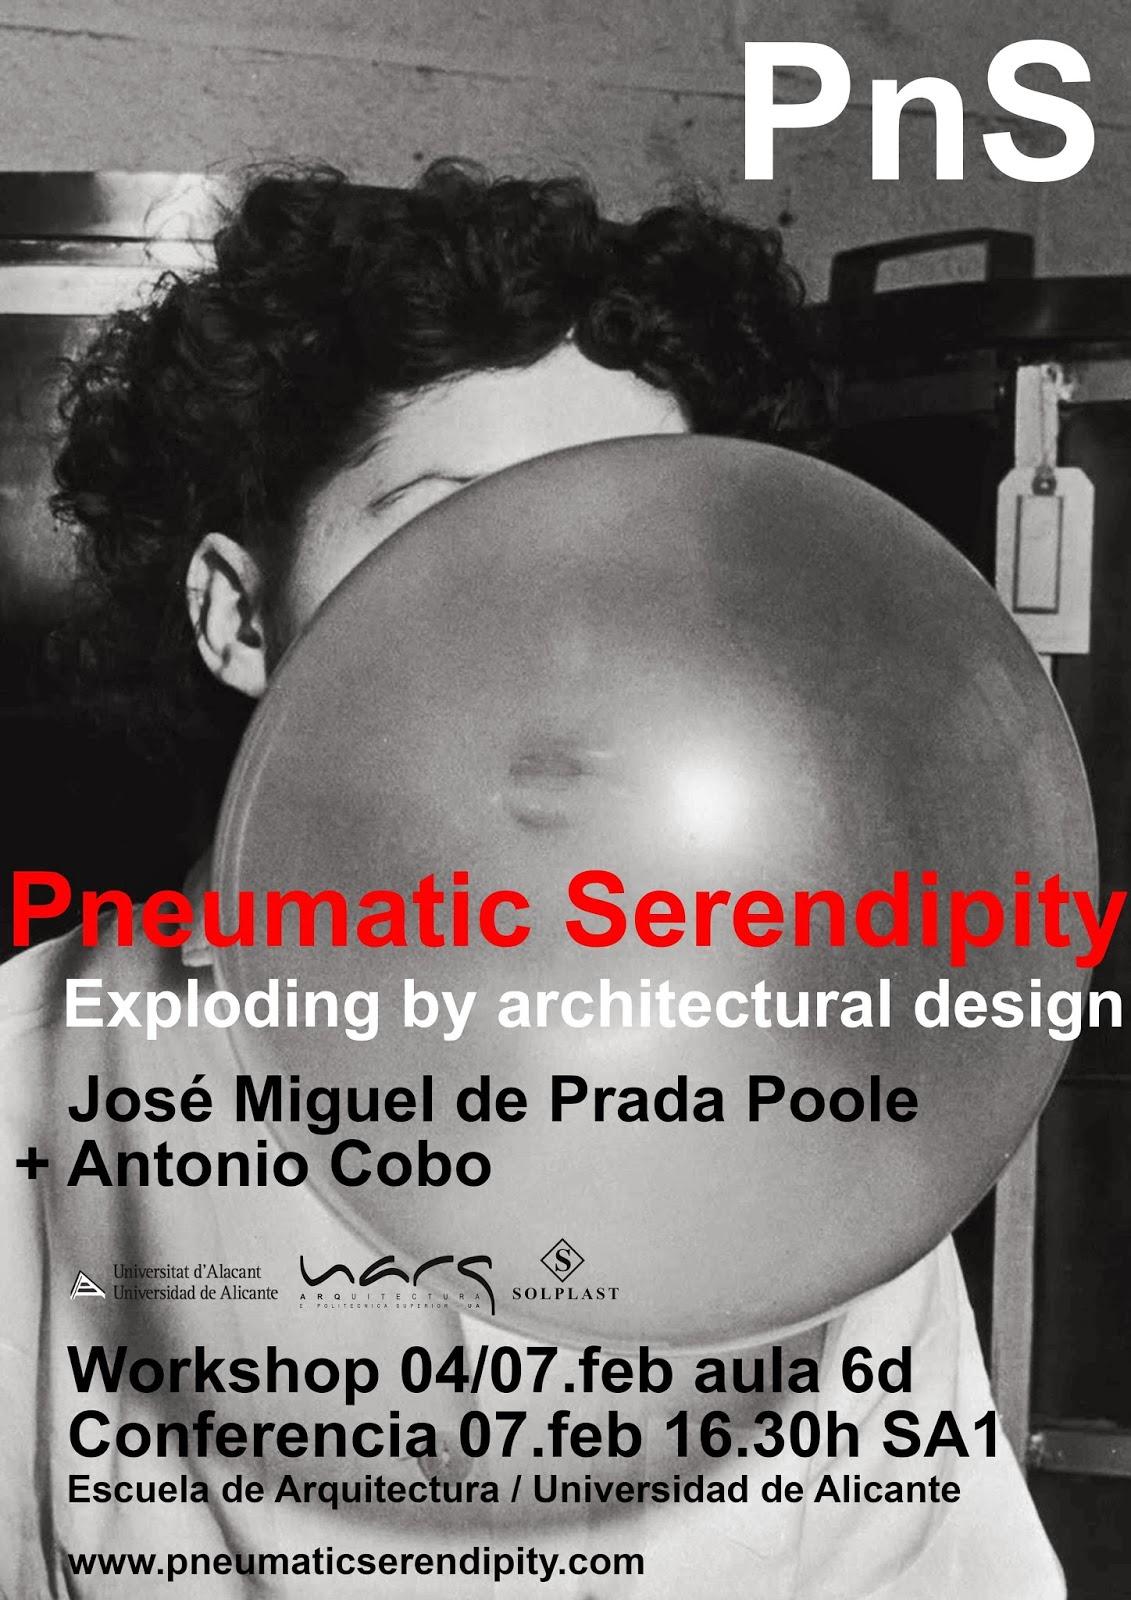 Pneumatic Serendipity